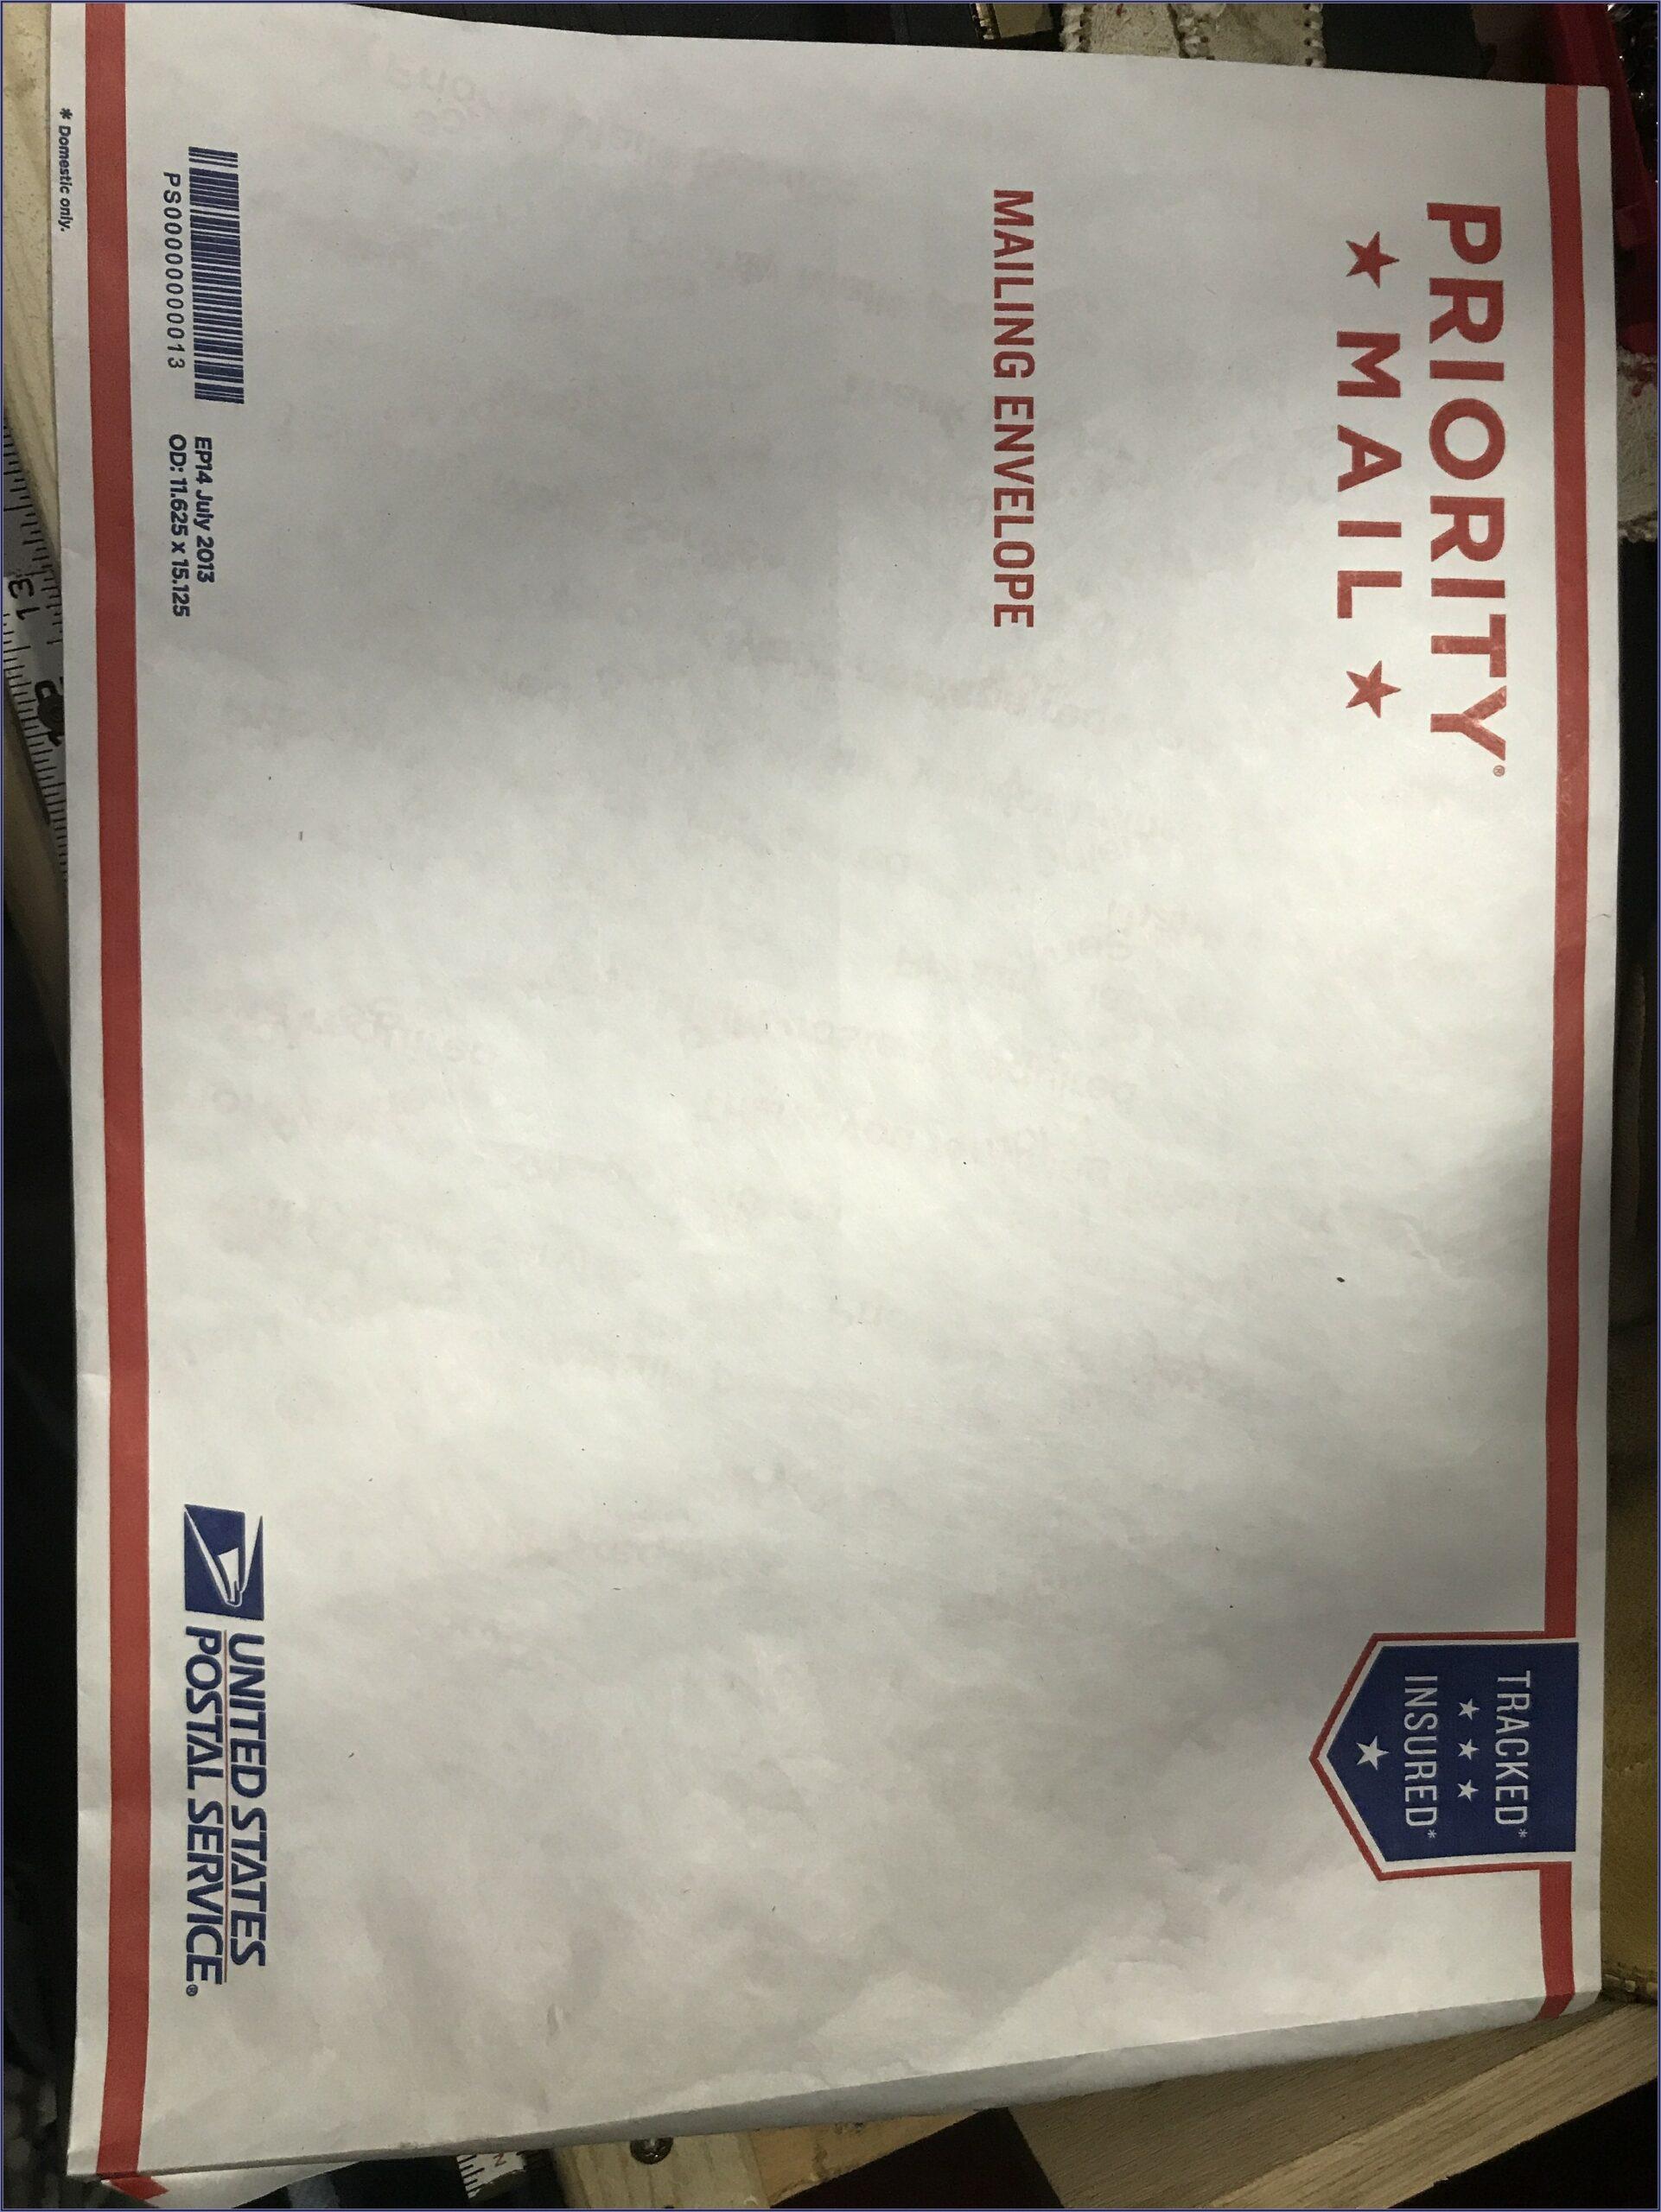 Priority Mail Mailing Envelope Vs Flat Rate Envelope